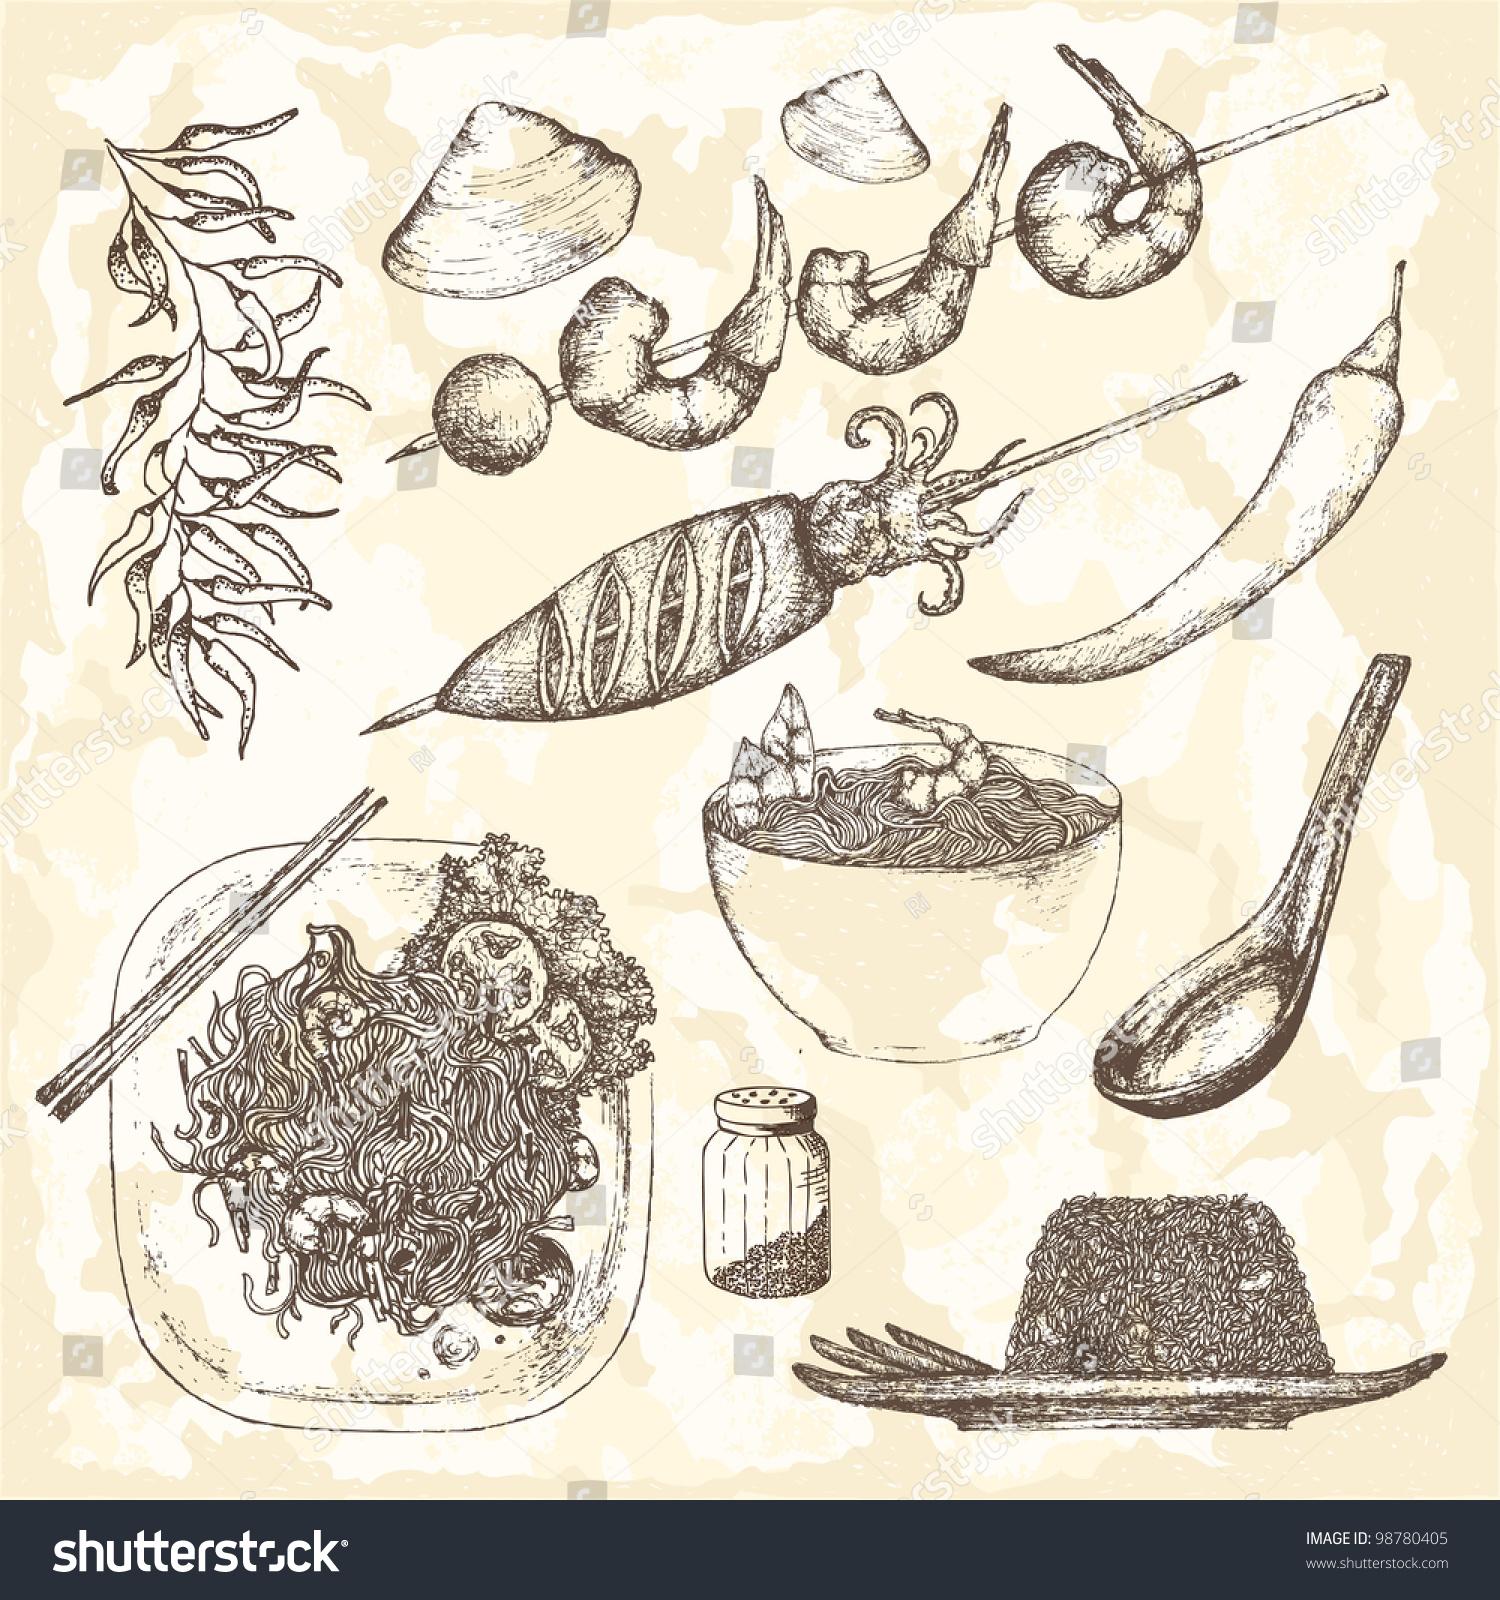 Handdrawn Asia Kitchen Food Set Stock Vector Shutterstock